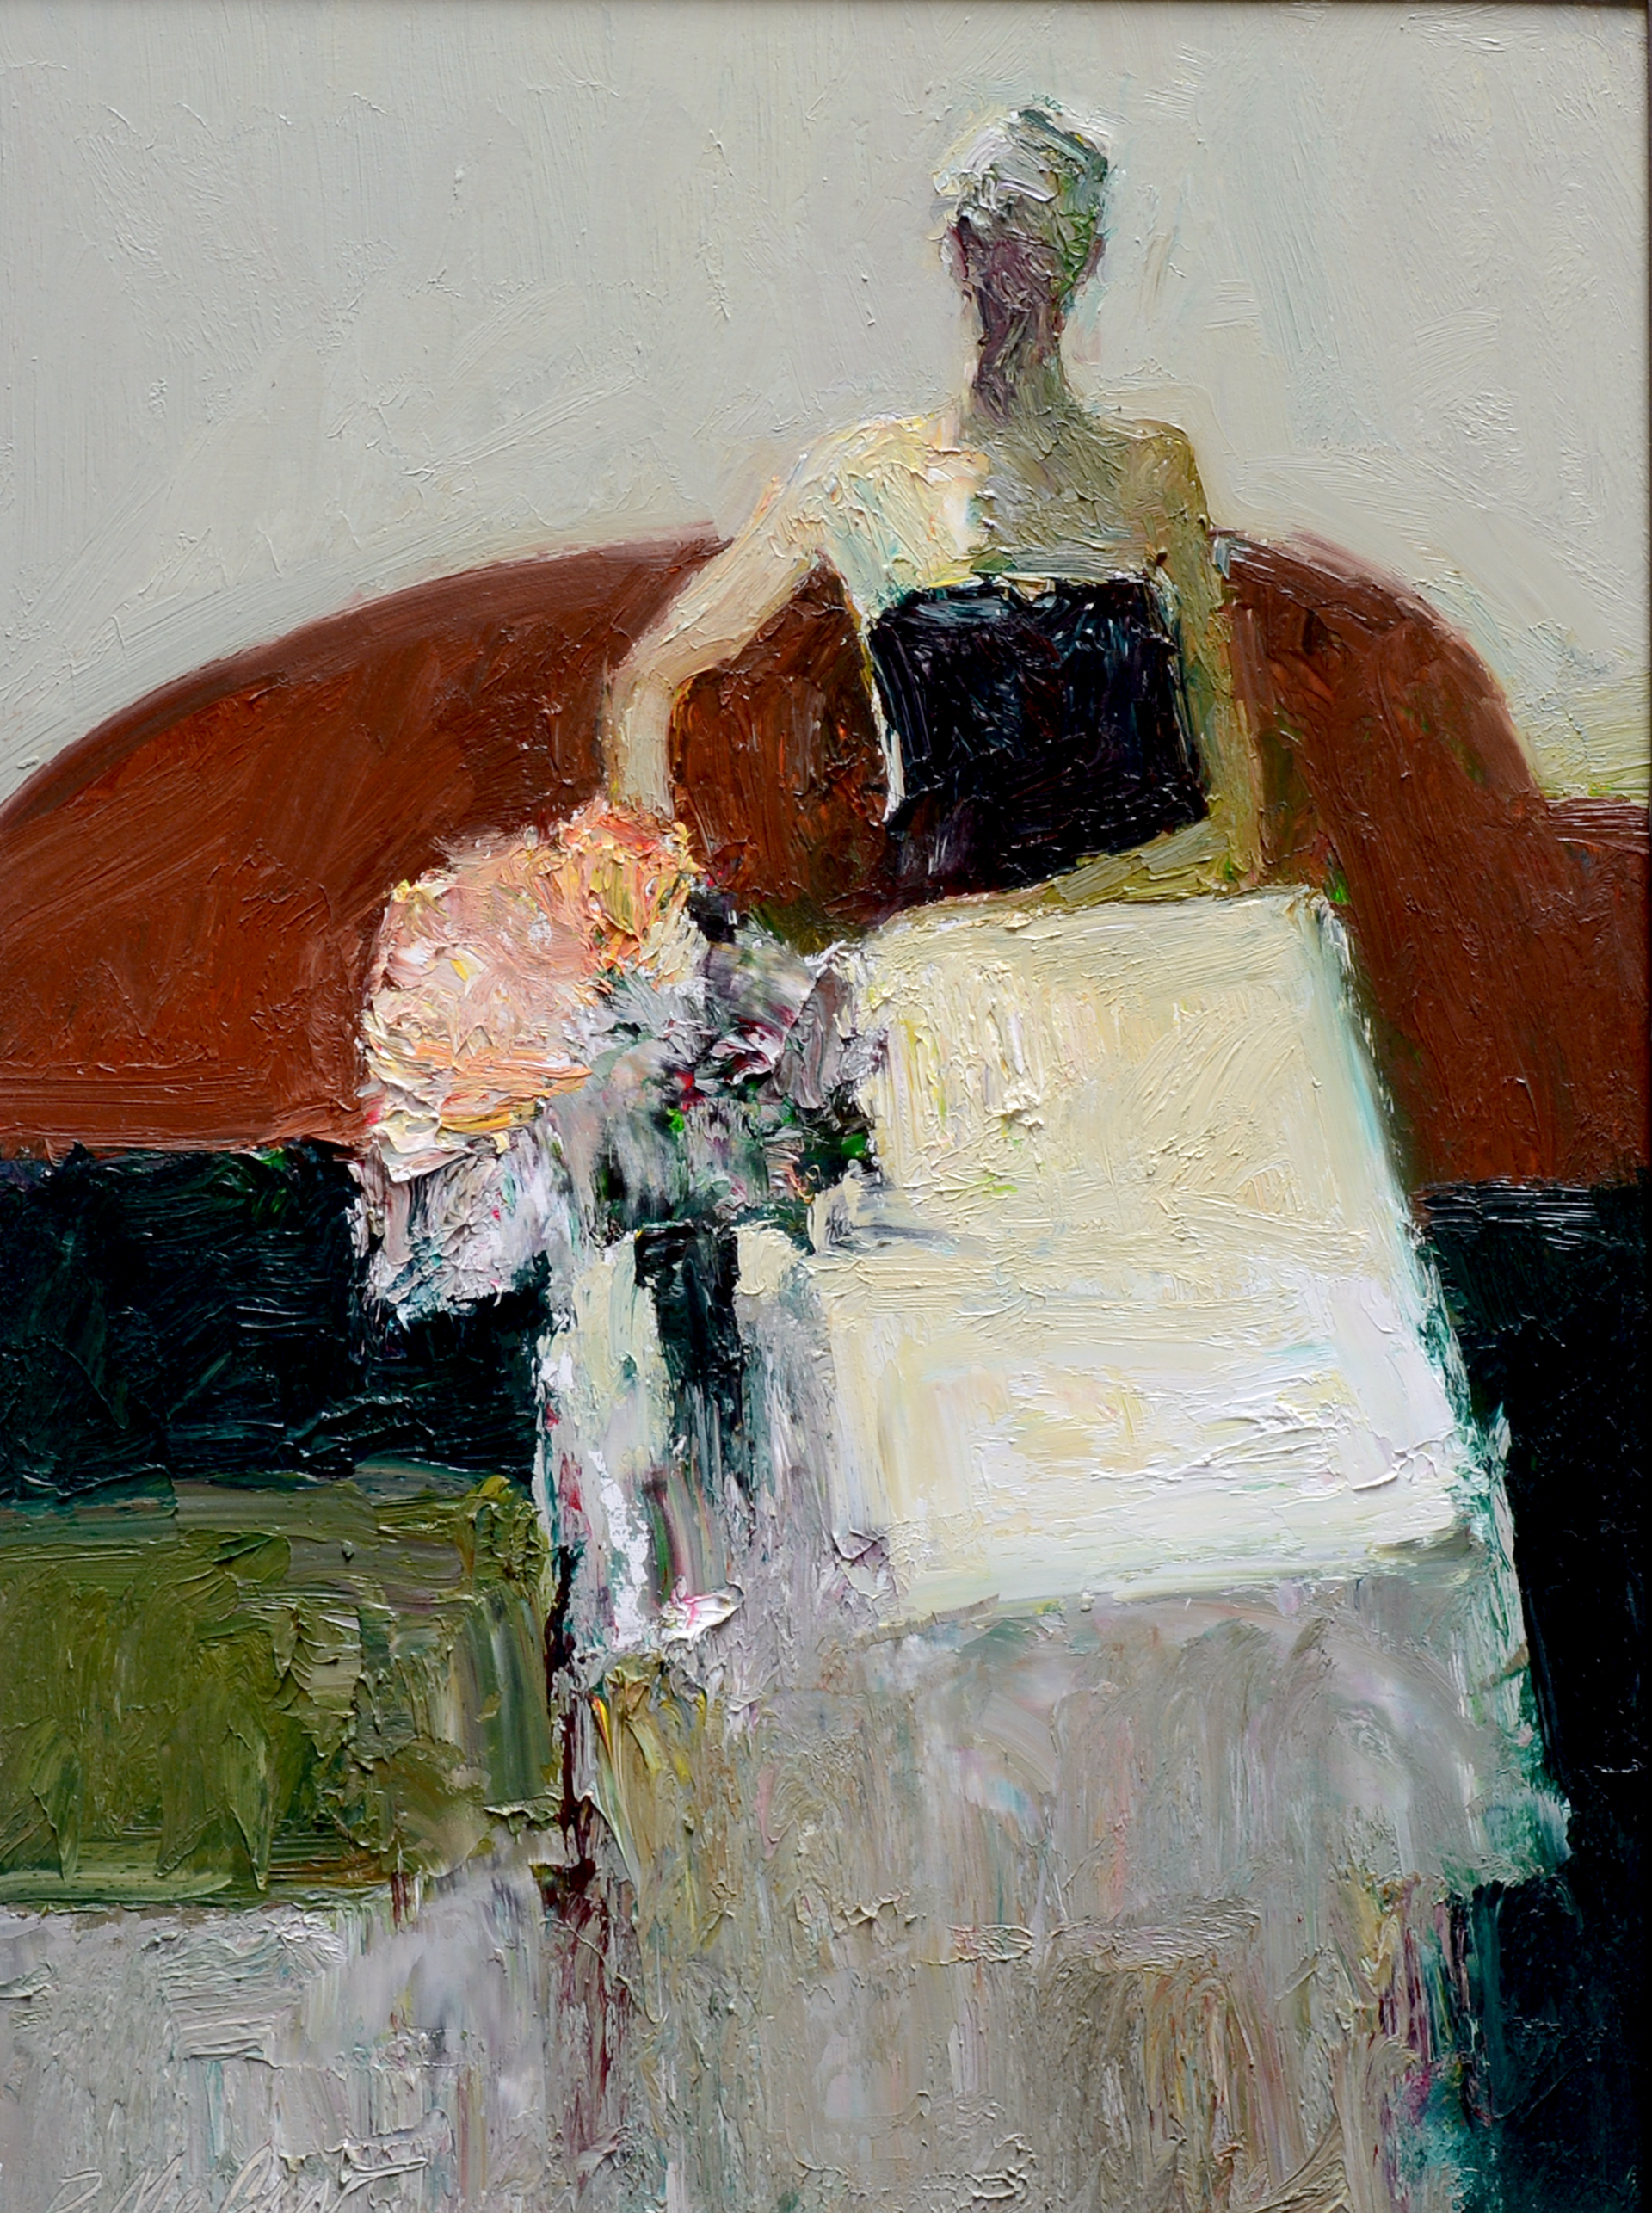 White Table by Dan McCaw